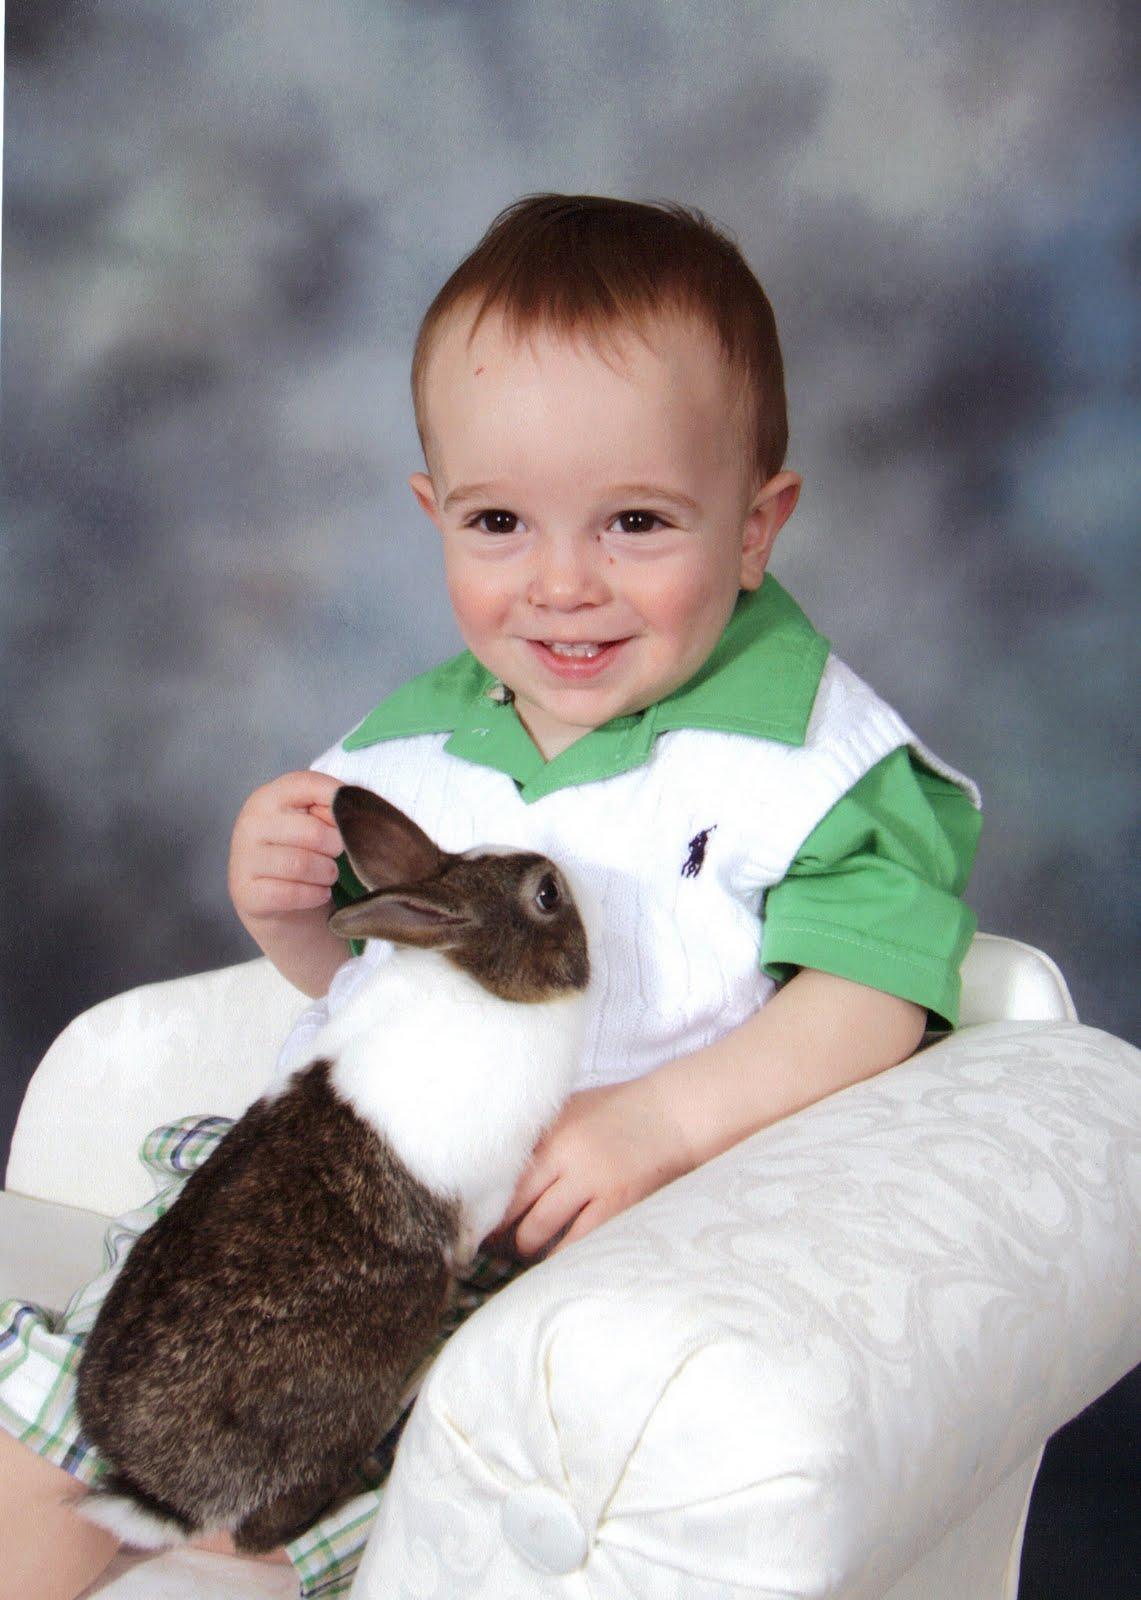 http://4.bp.blogspot.com/-p289MRH_V1Q/TZD_8XnkrPI/AAAAAAAAAuc/x4y9BtiKbFQ/s1600/Easter%25252BMick.JPG